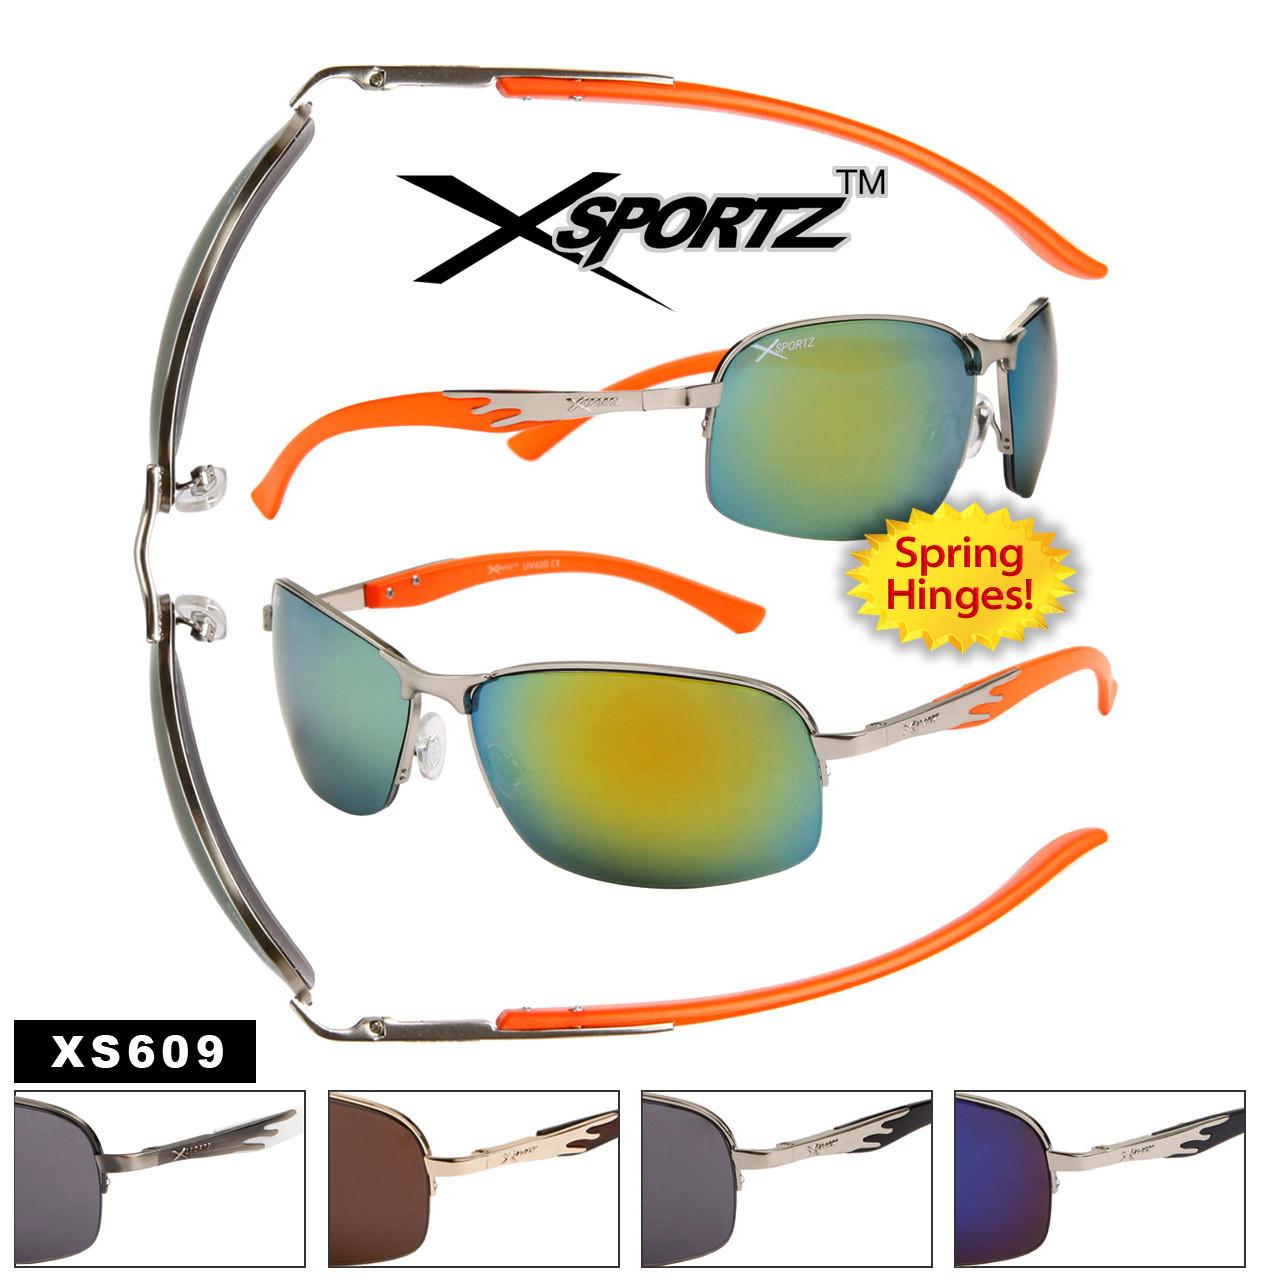 Wholesale Xsportz™ Sports Sunglasses - Style # XS609